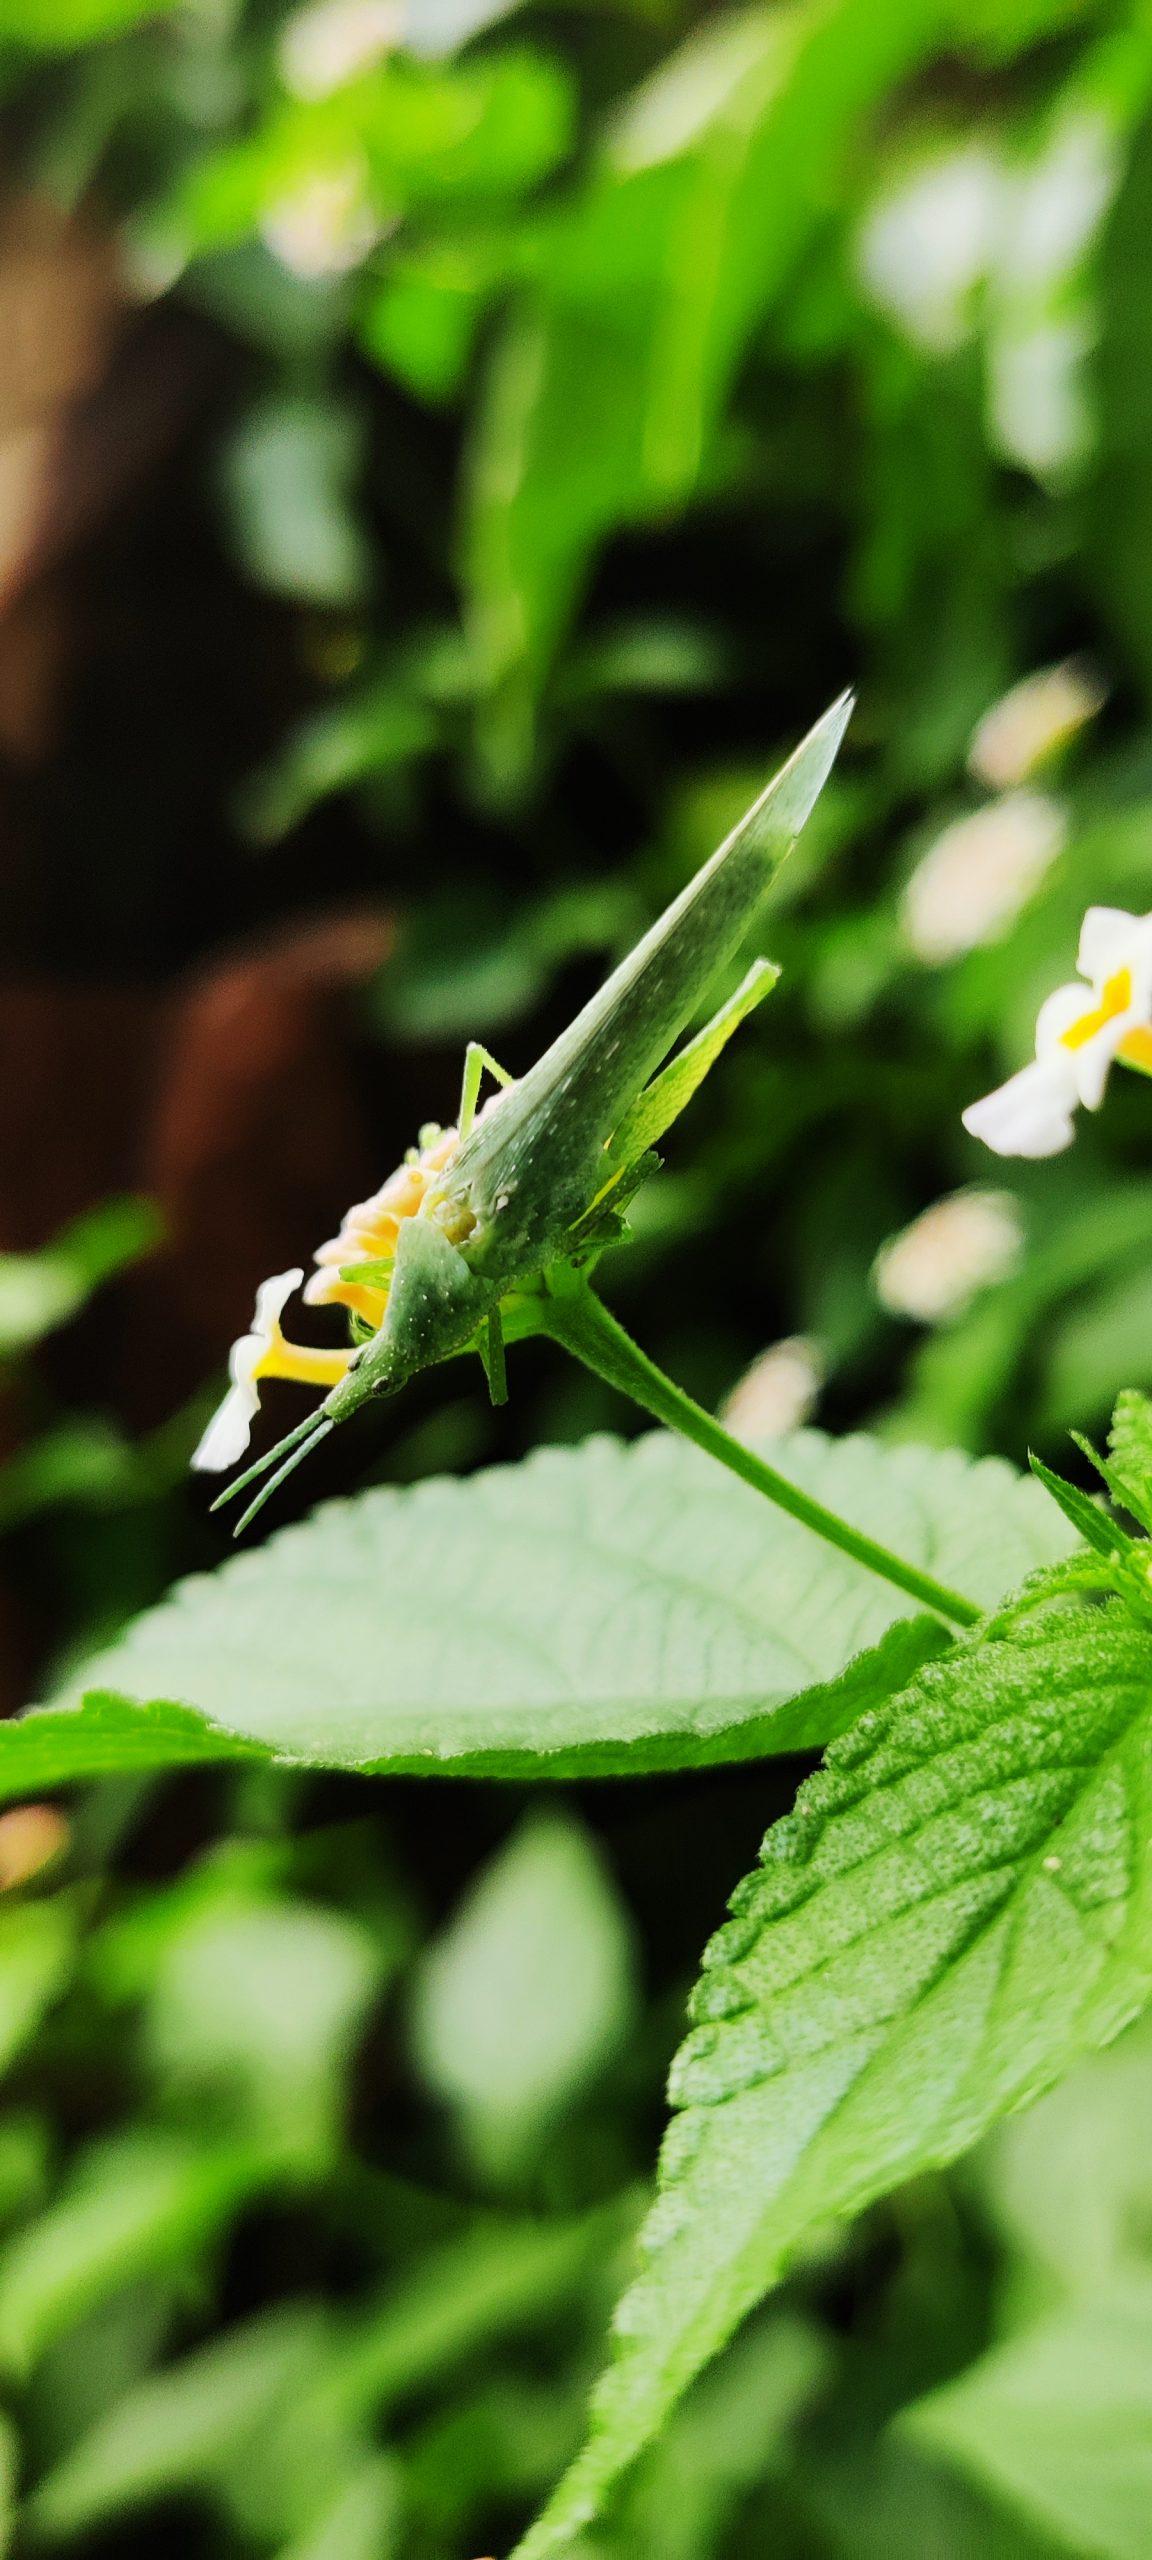 grasshopper on a flower